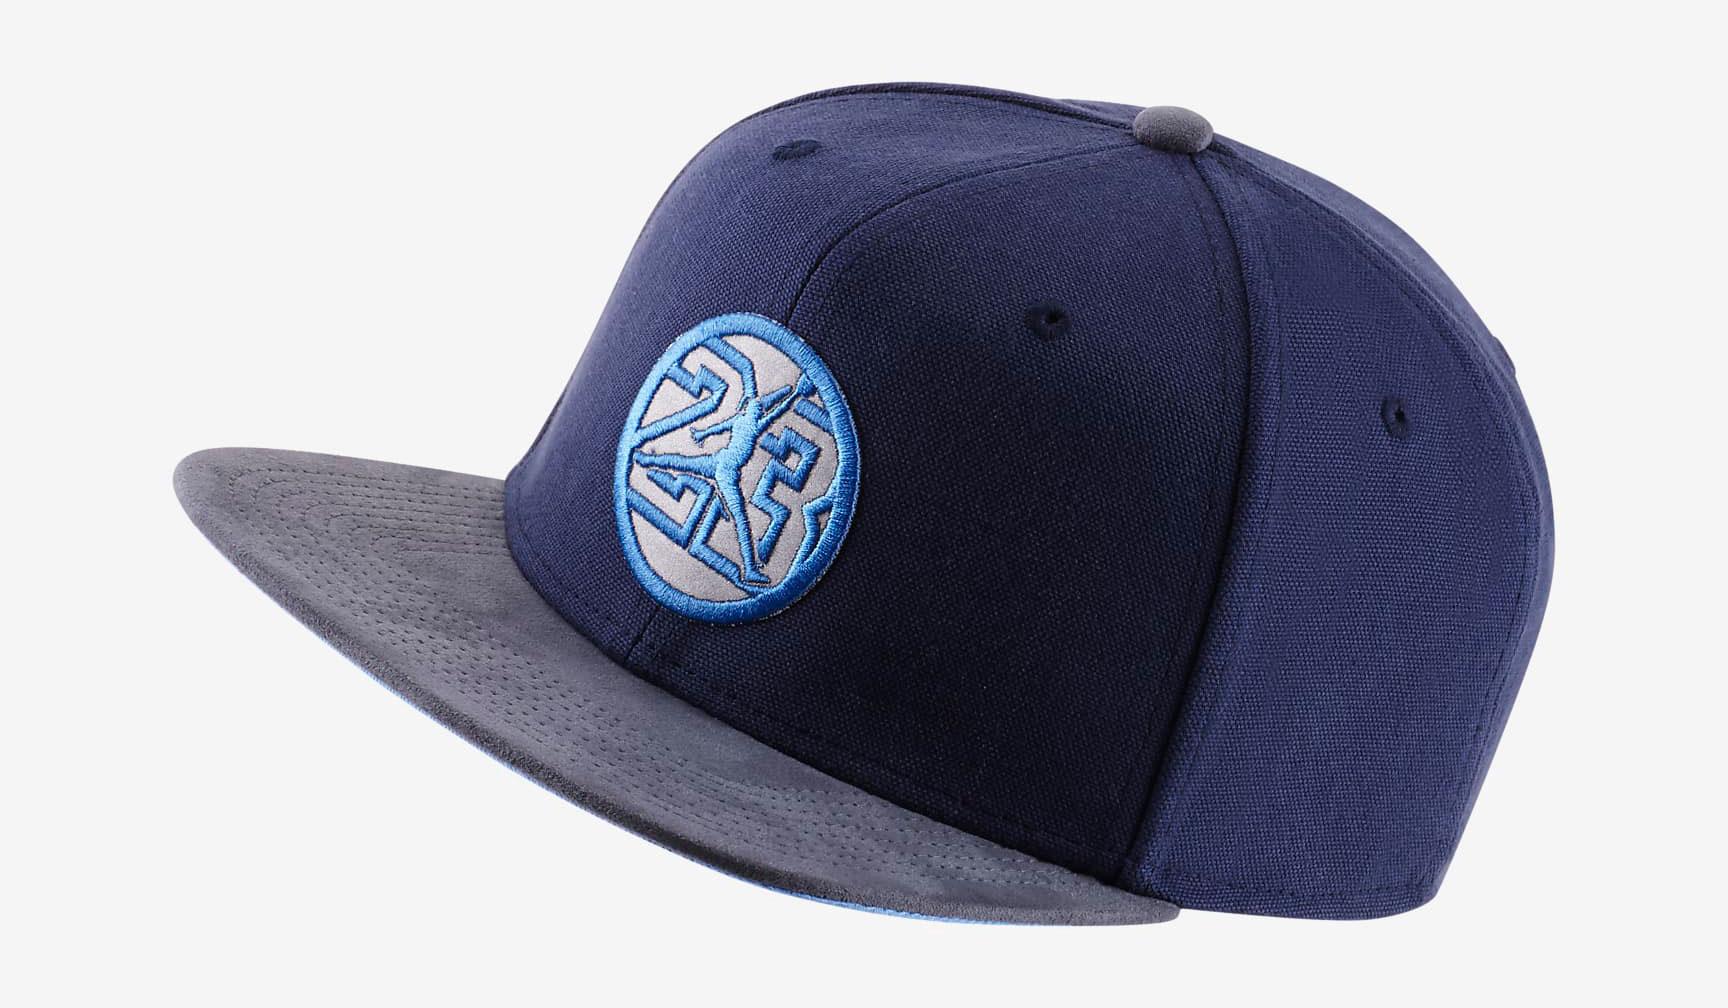 jordan-12-indigo-stone-blue-hat-match-1